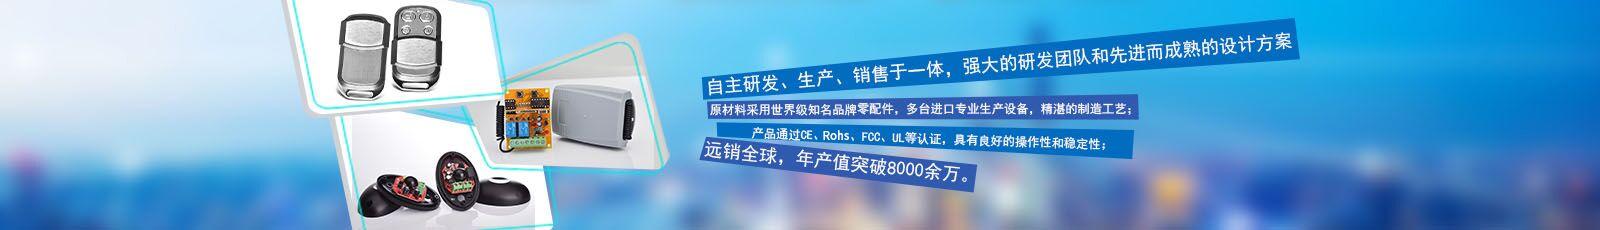 365you戏厅suo有产品均通过CE及欧盟RoHShuan保指令